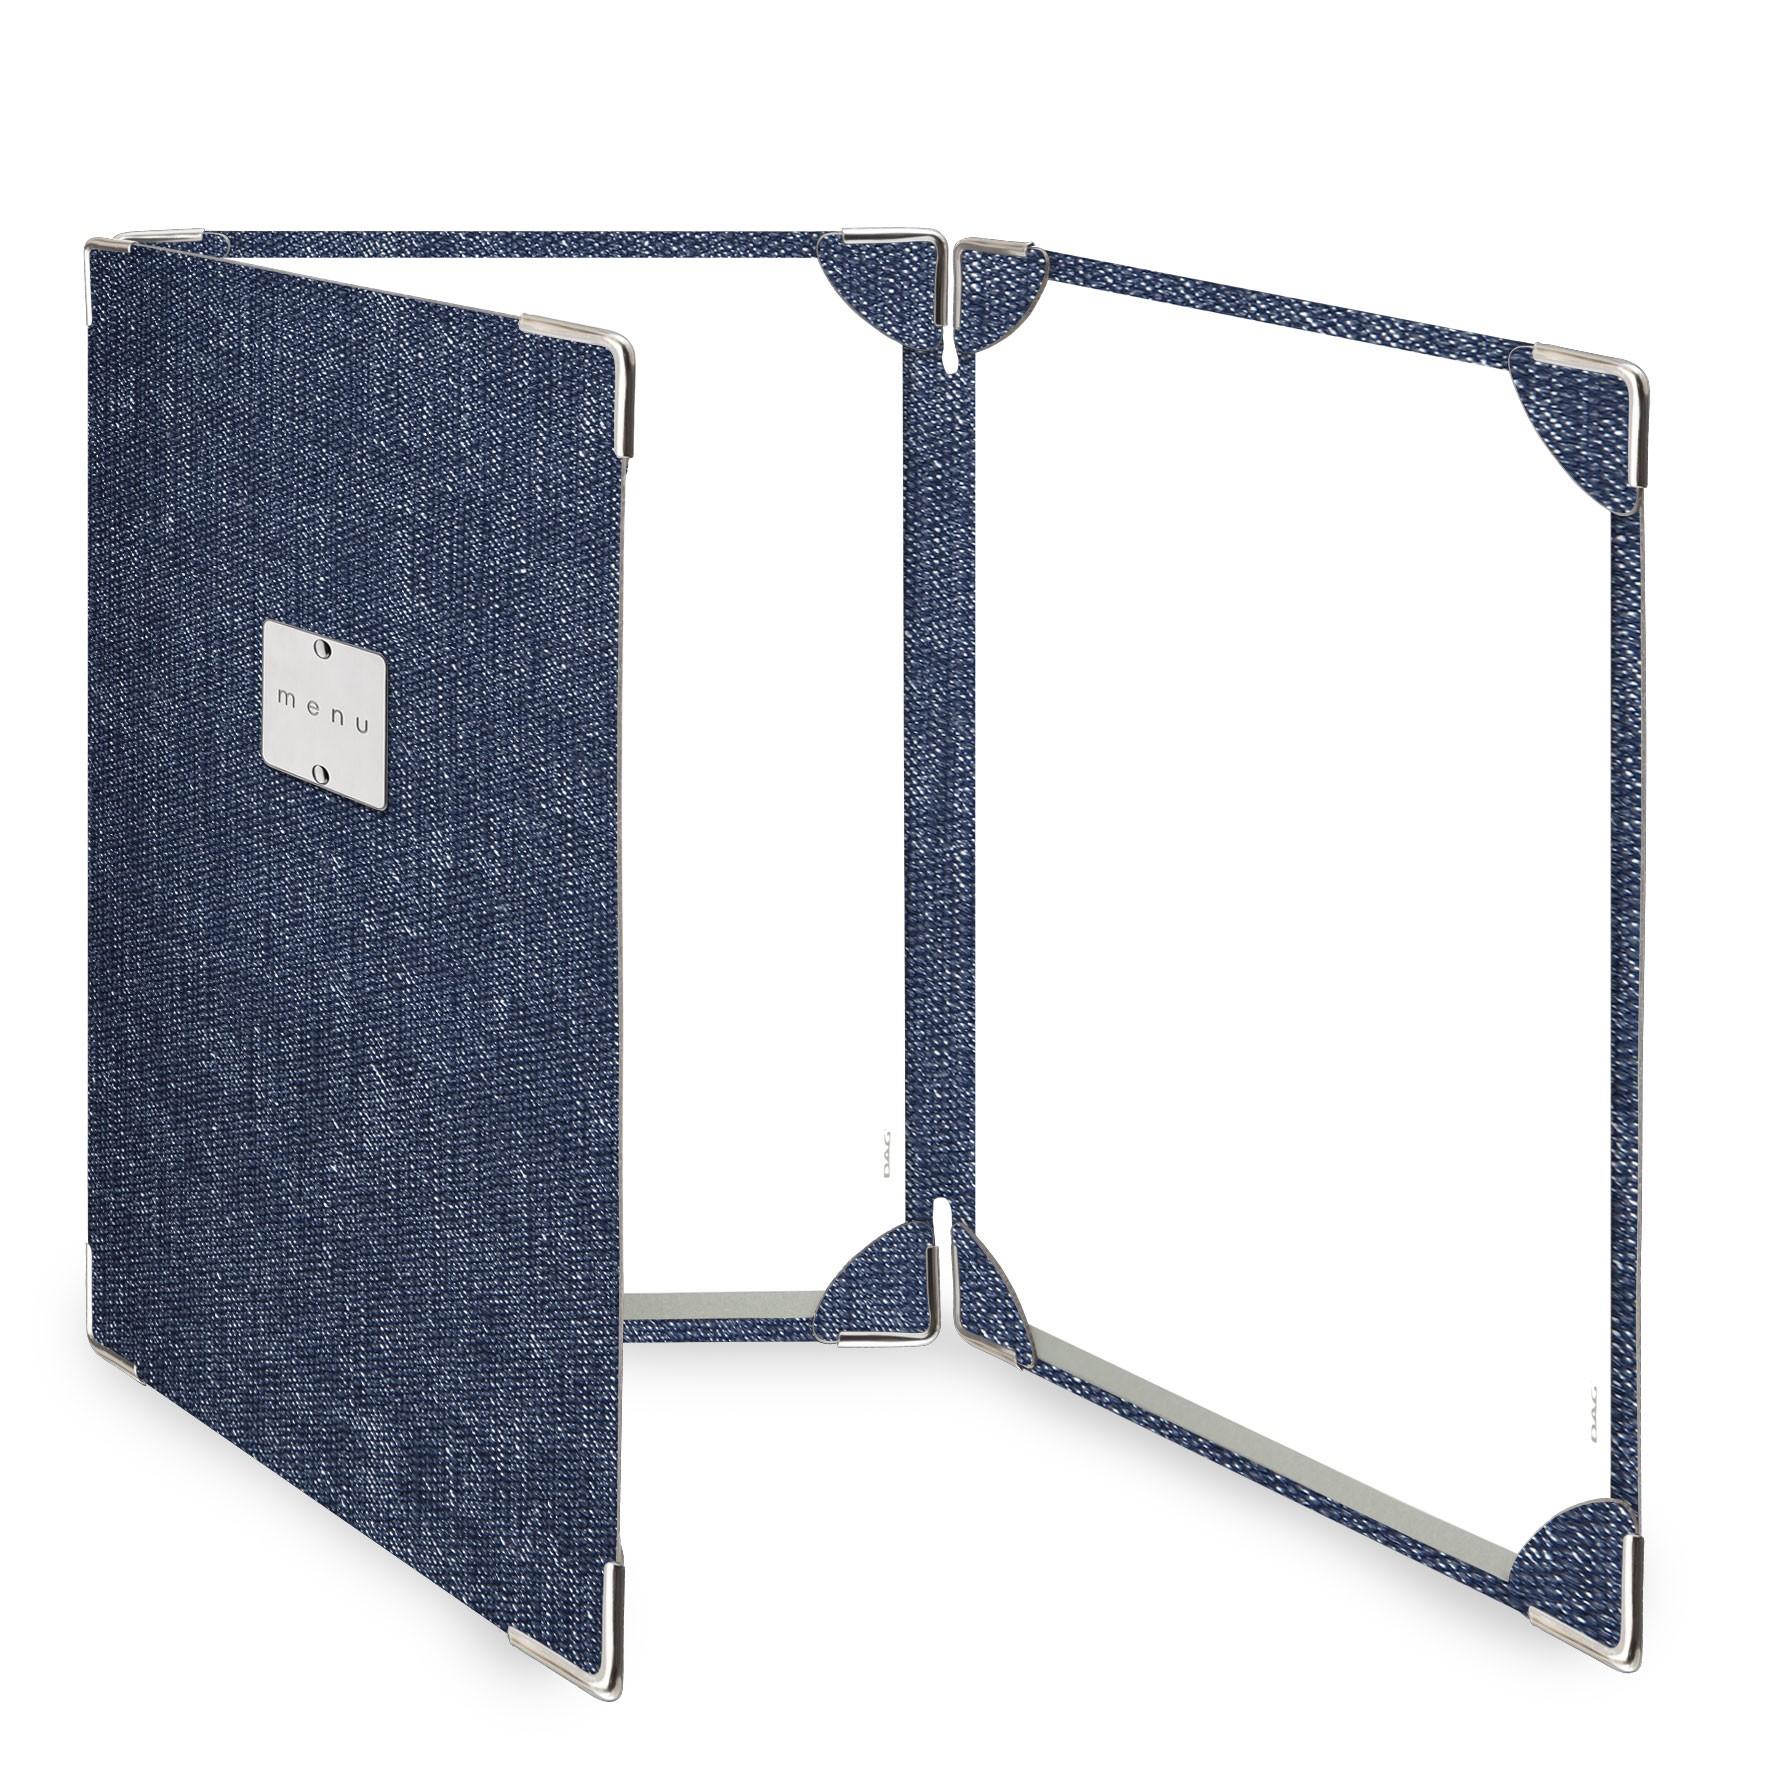 Protège menu 3 volets MenuMenu bleu aspect jean's